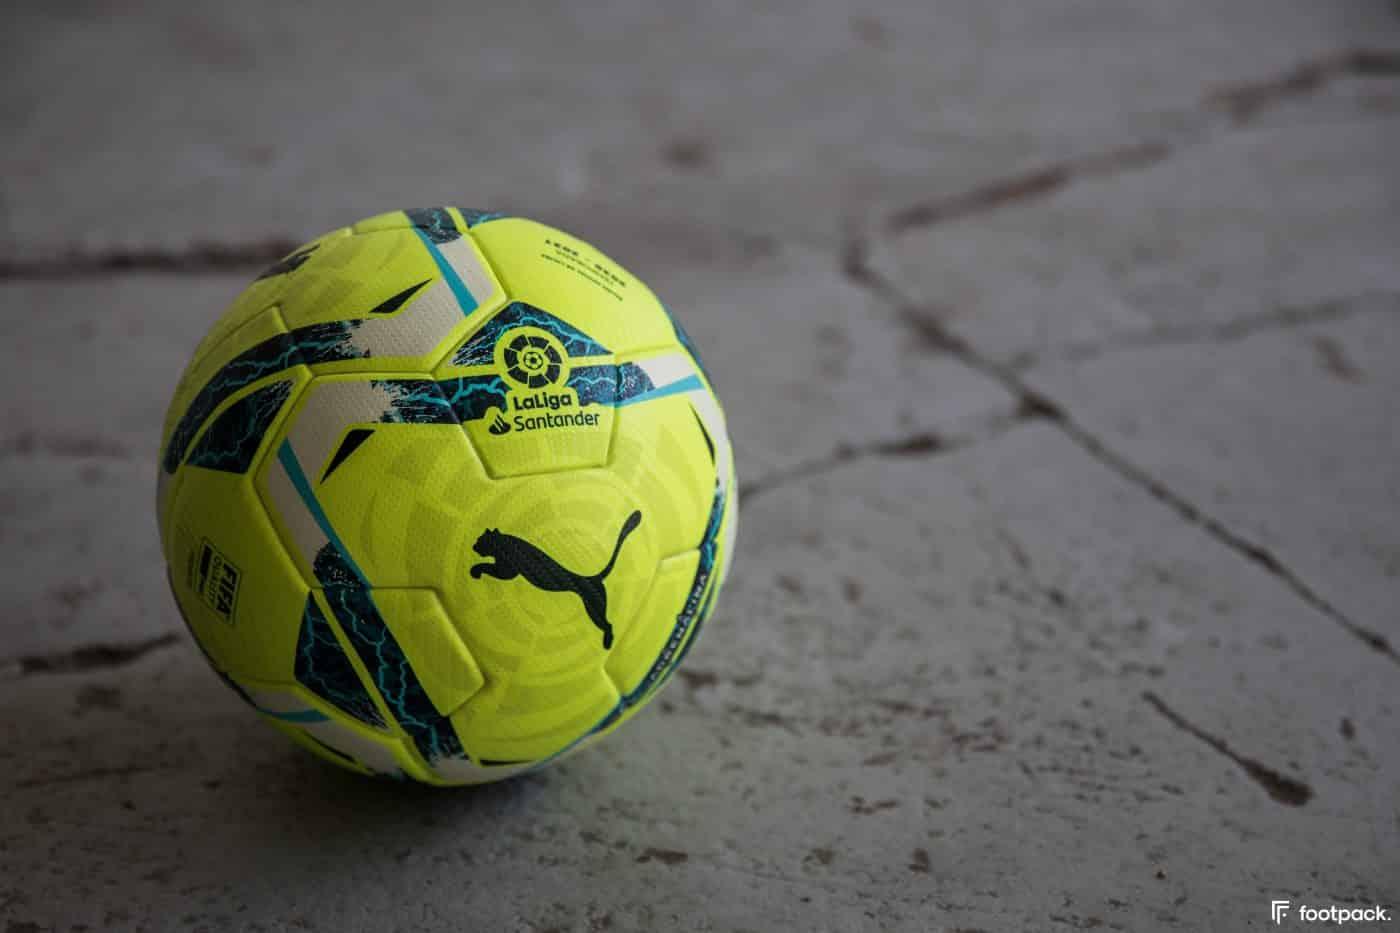 ballon-puma-barcelone-real-madrid-footpack-puma-liga-ball-footapck-4